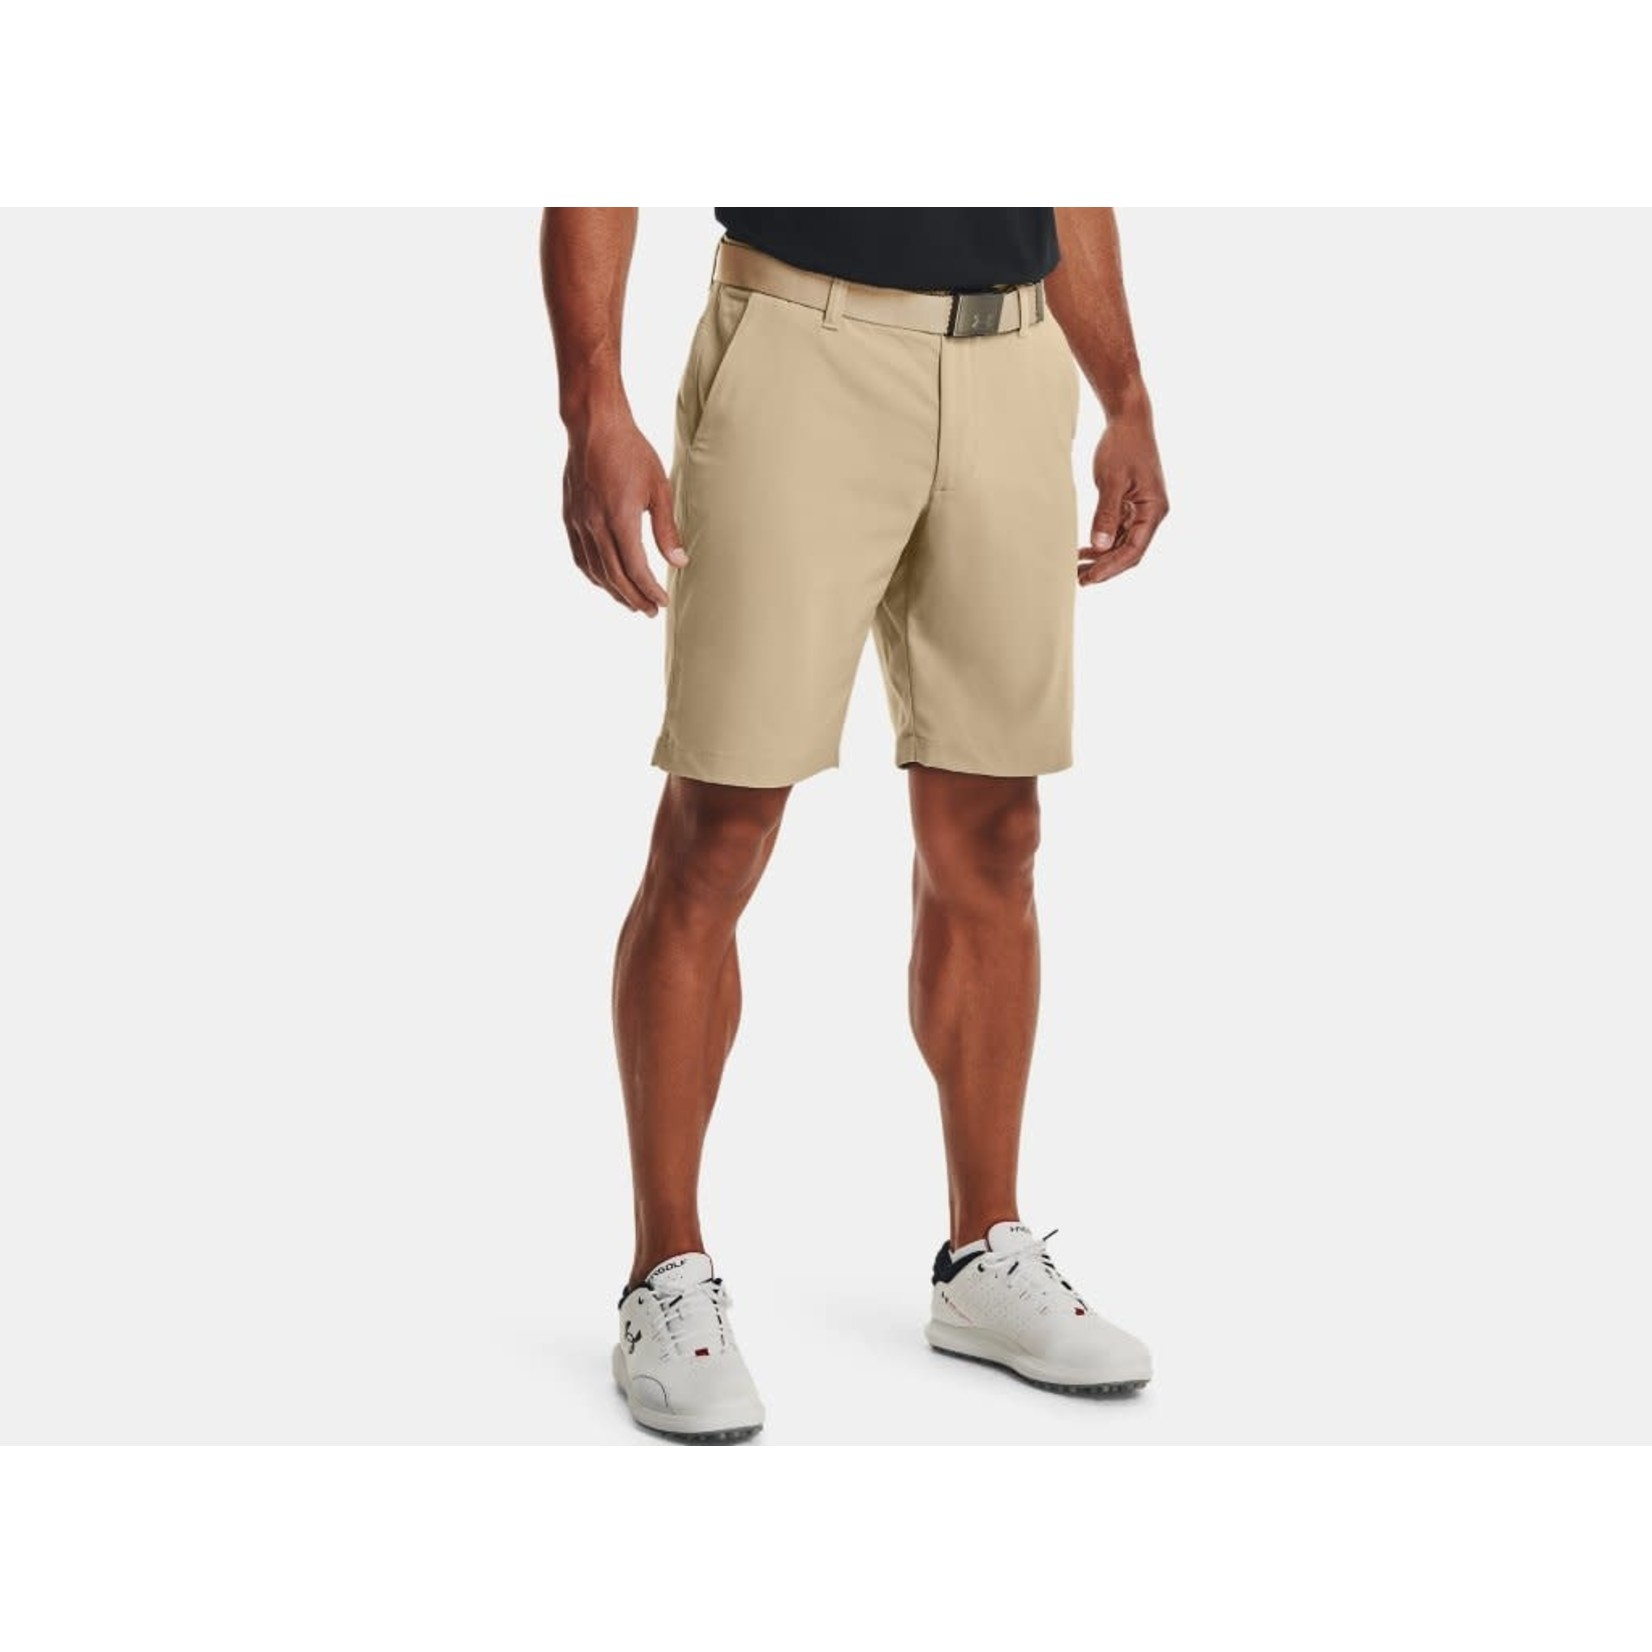 Under Armour Under Armour Golf Shorts, Showdown, Mens